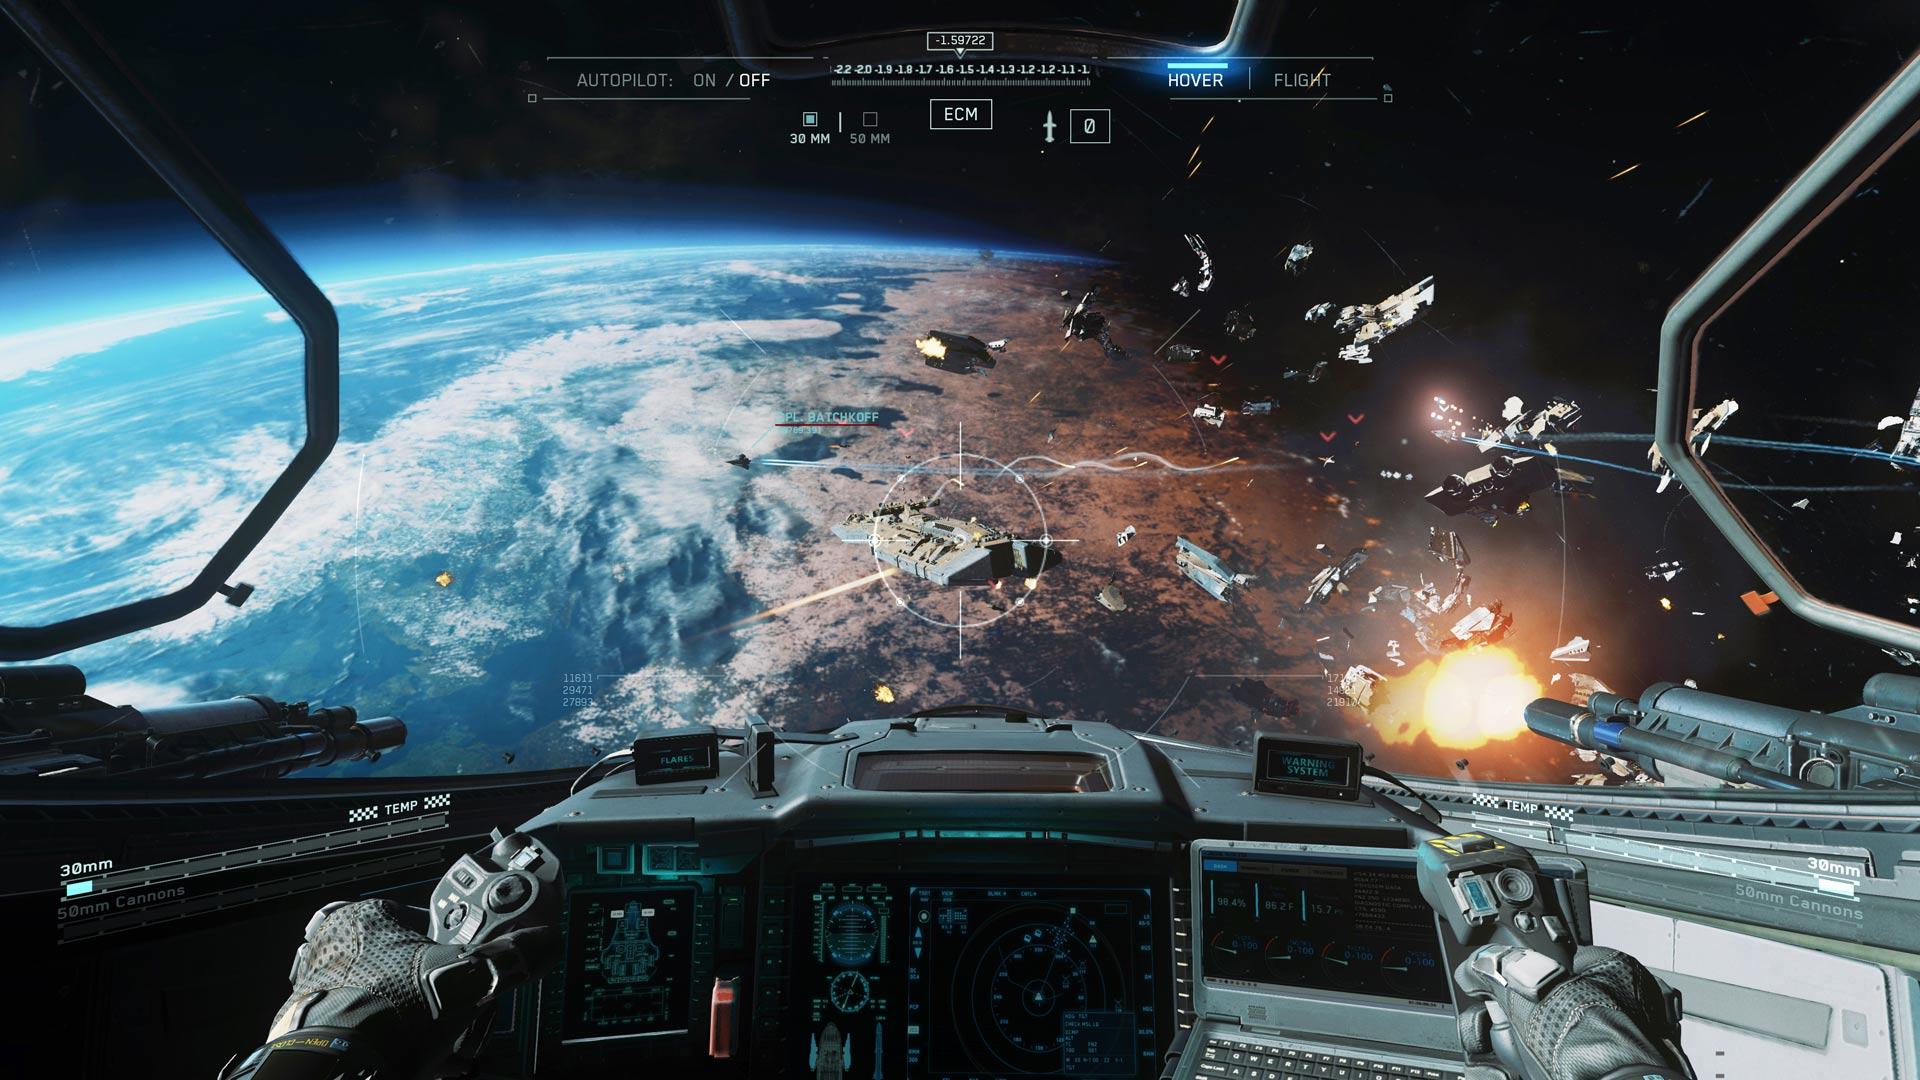 Call of Duty: Infinite Warfare Screenshot 2